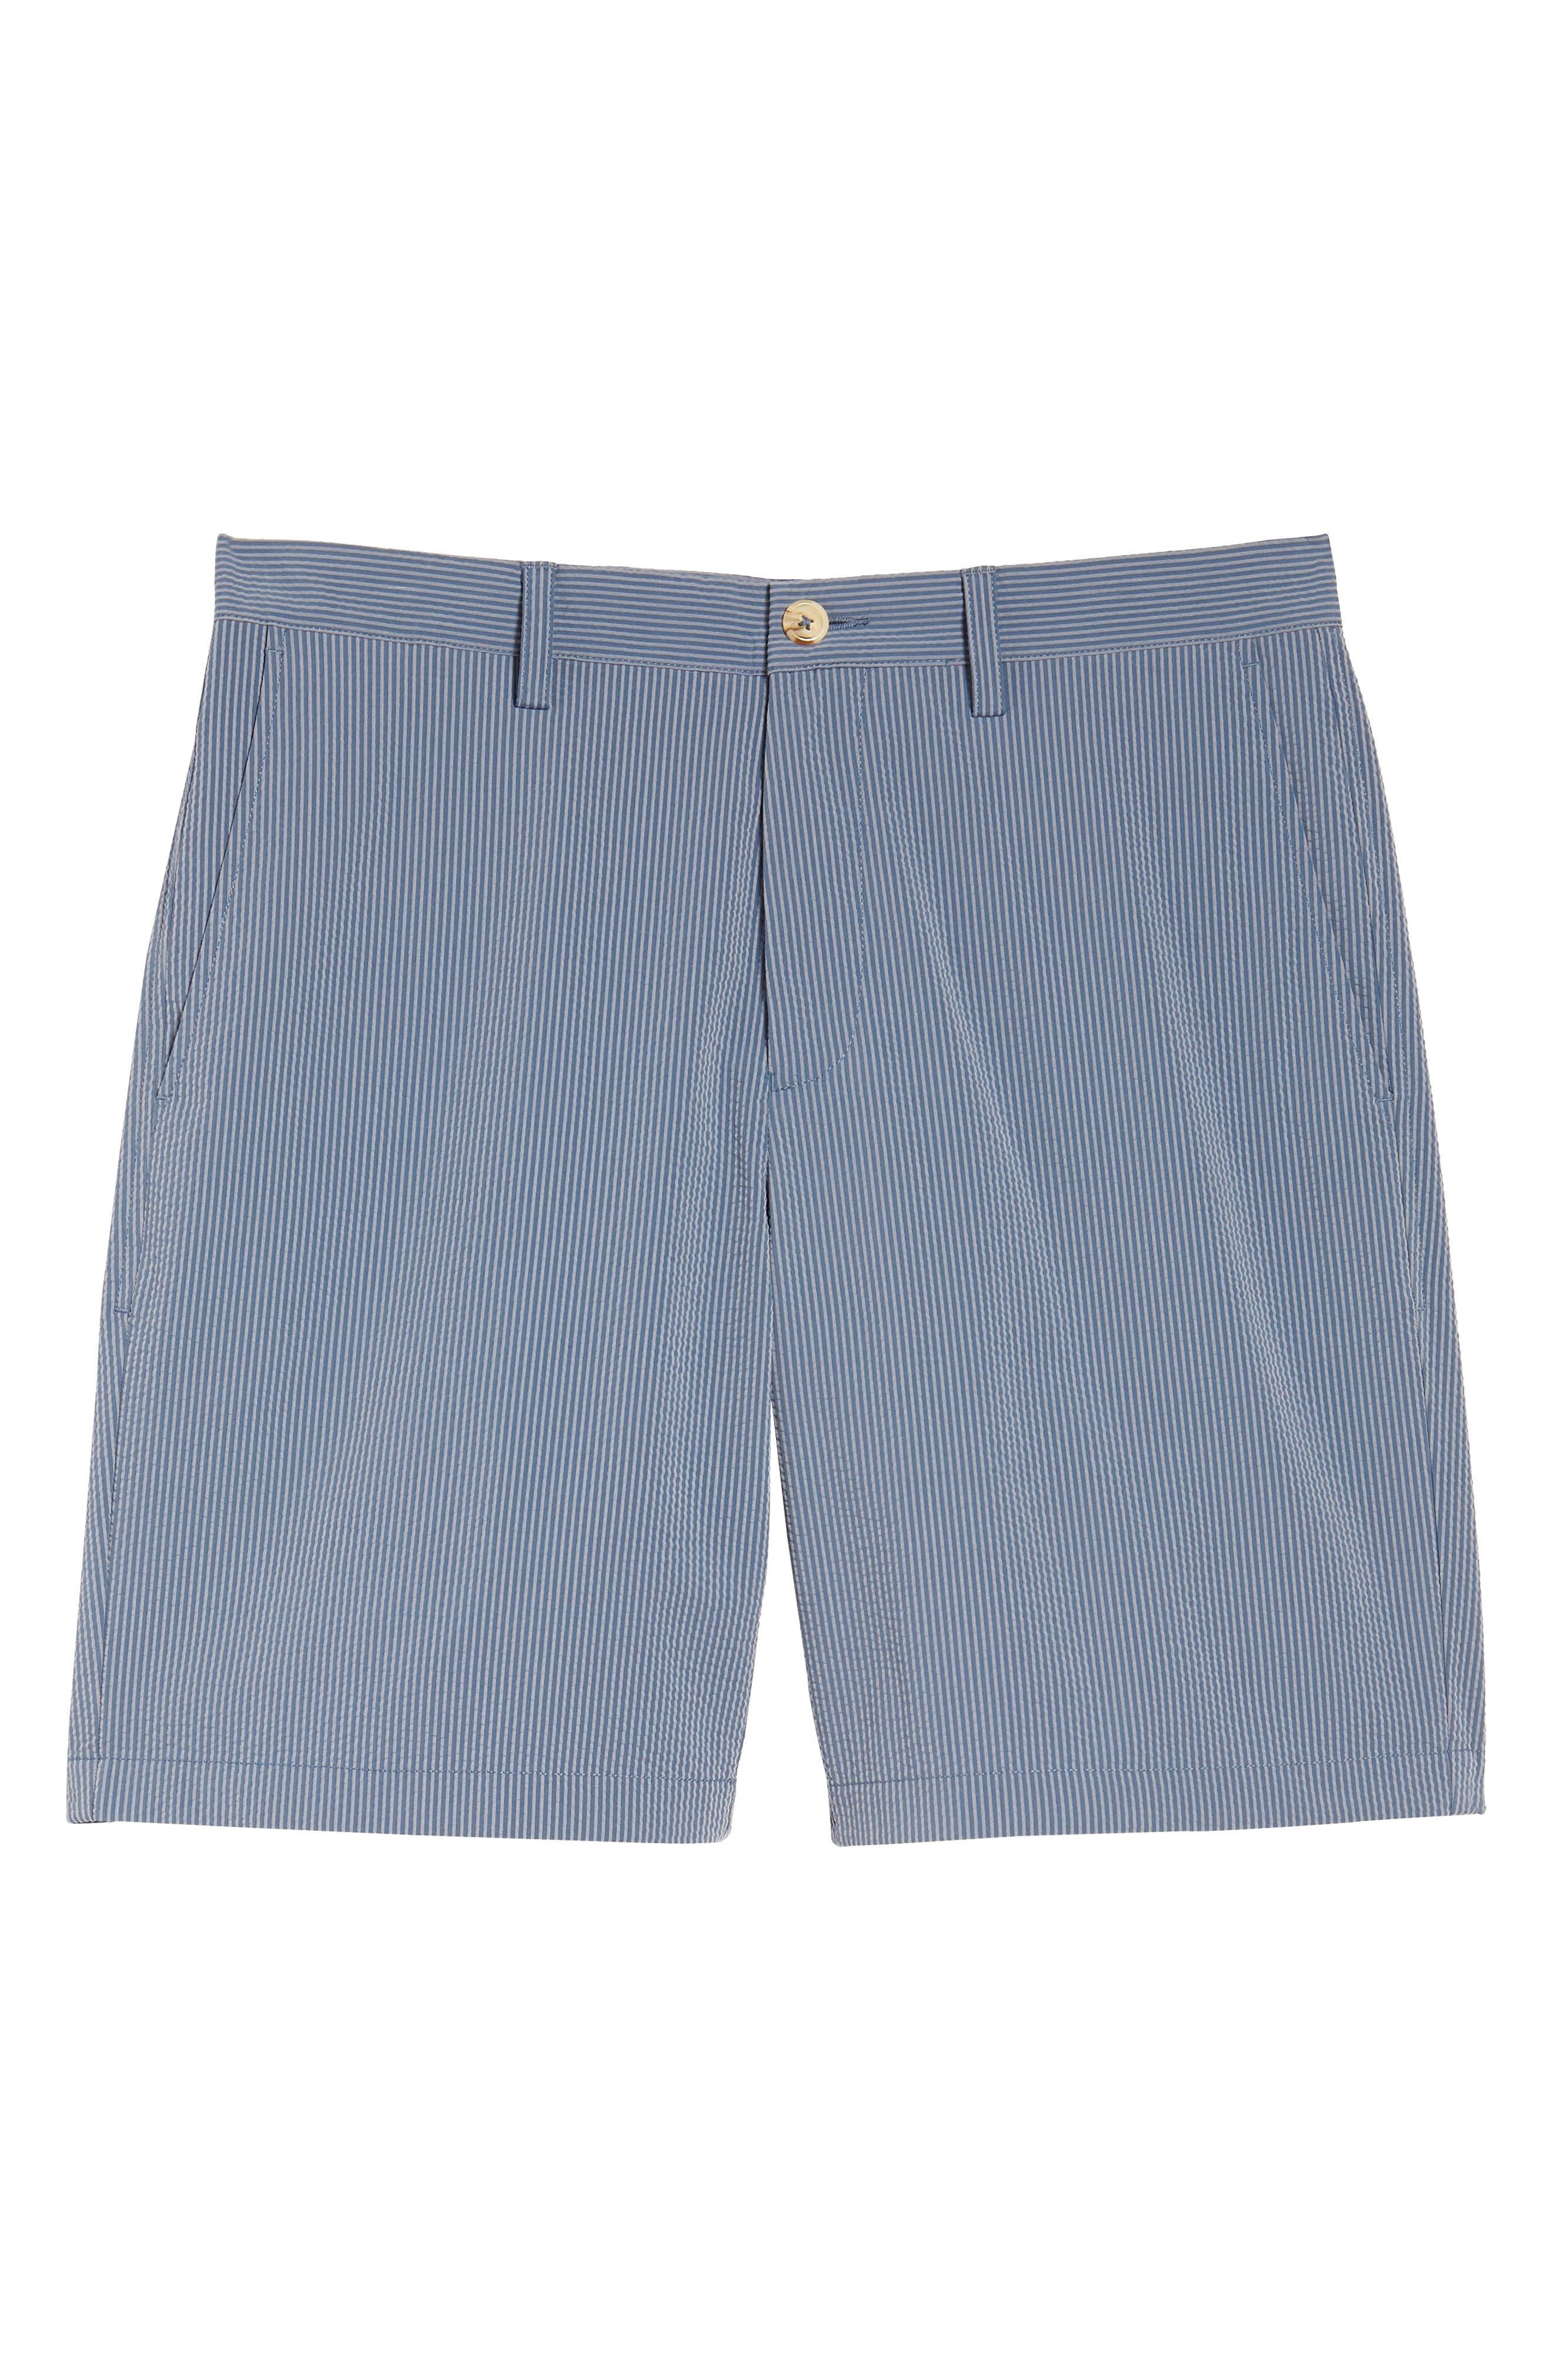 Seersucker Shorts,                             Alternate thumbnail 6, color,                             425